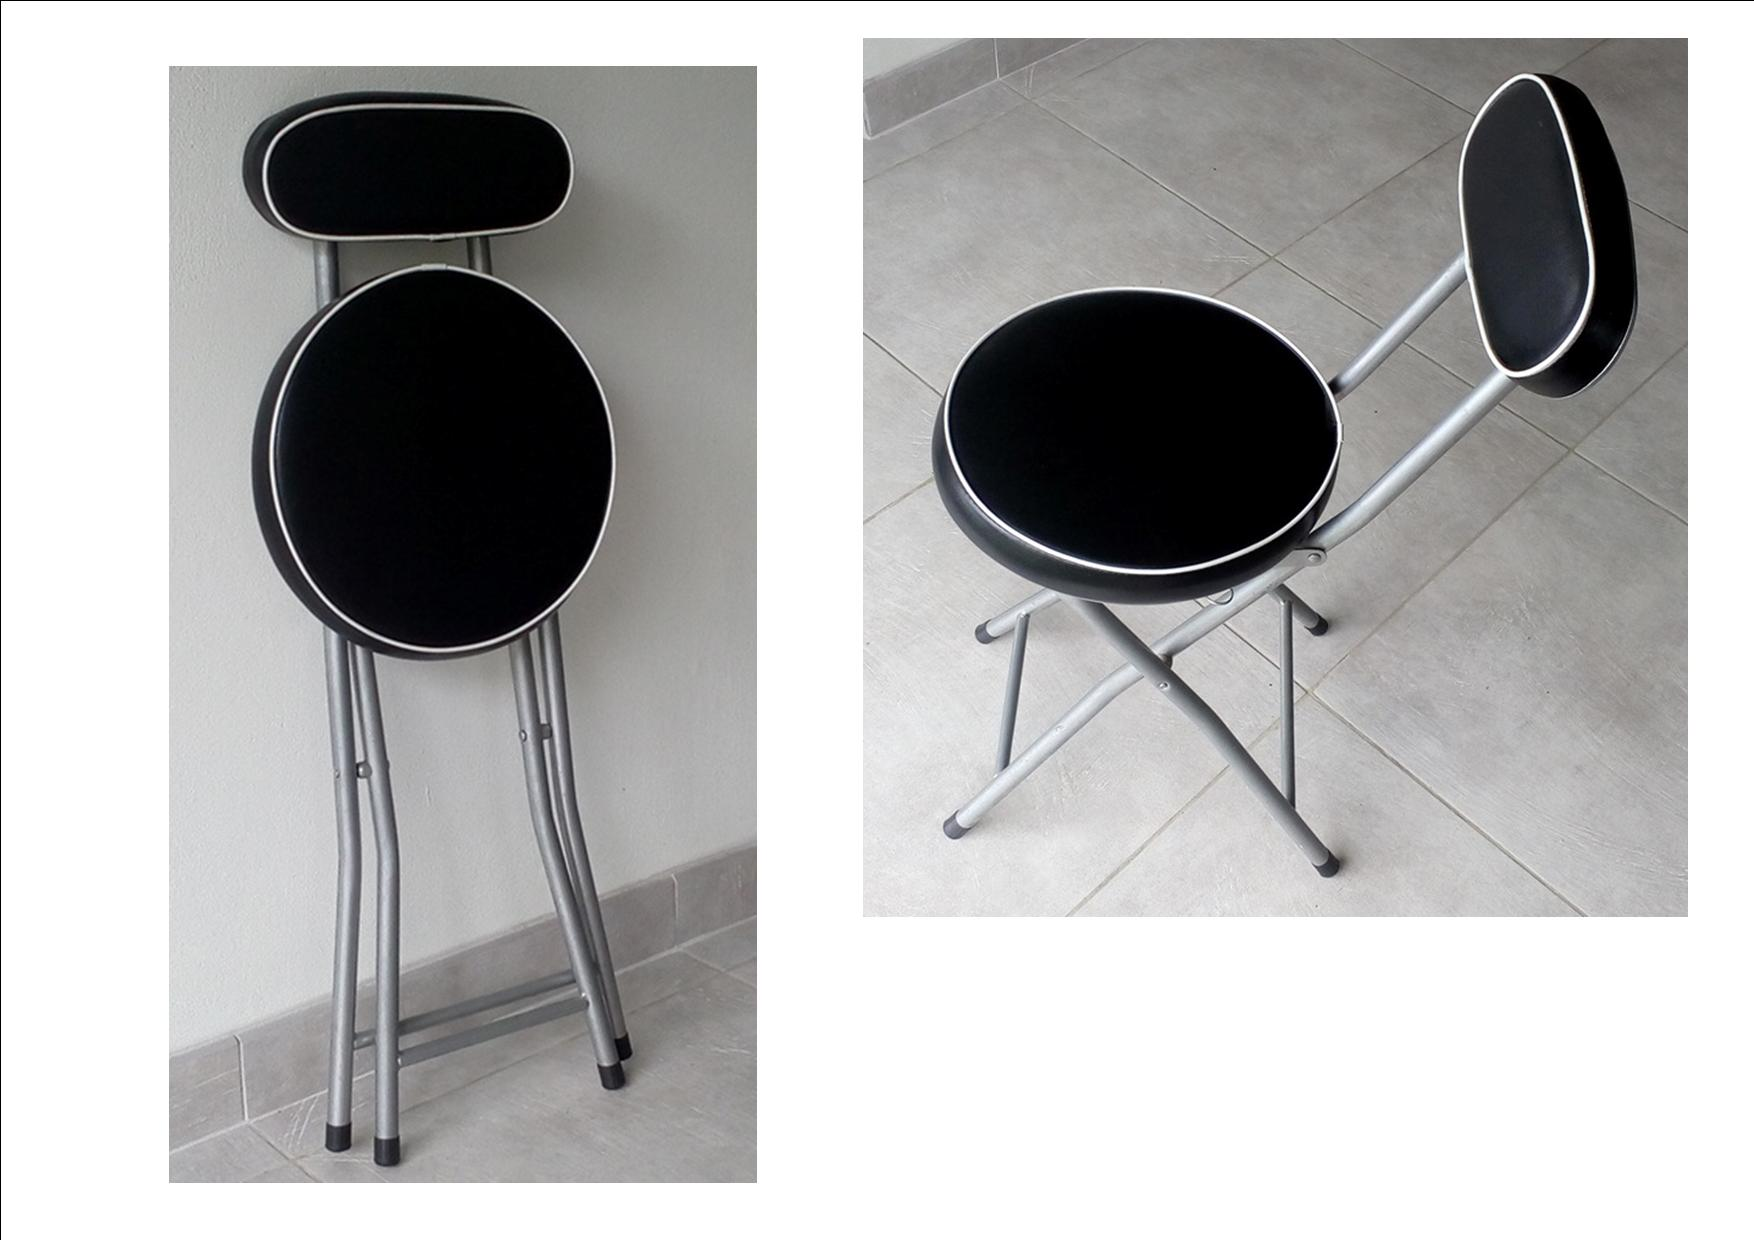 chaise pliable big ce. Black Bedroom Furniture Sets. Home Design Ideas